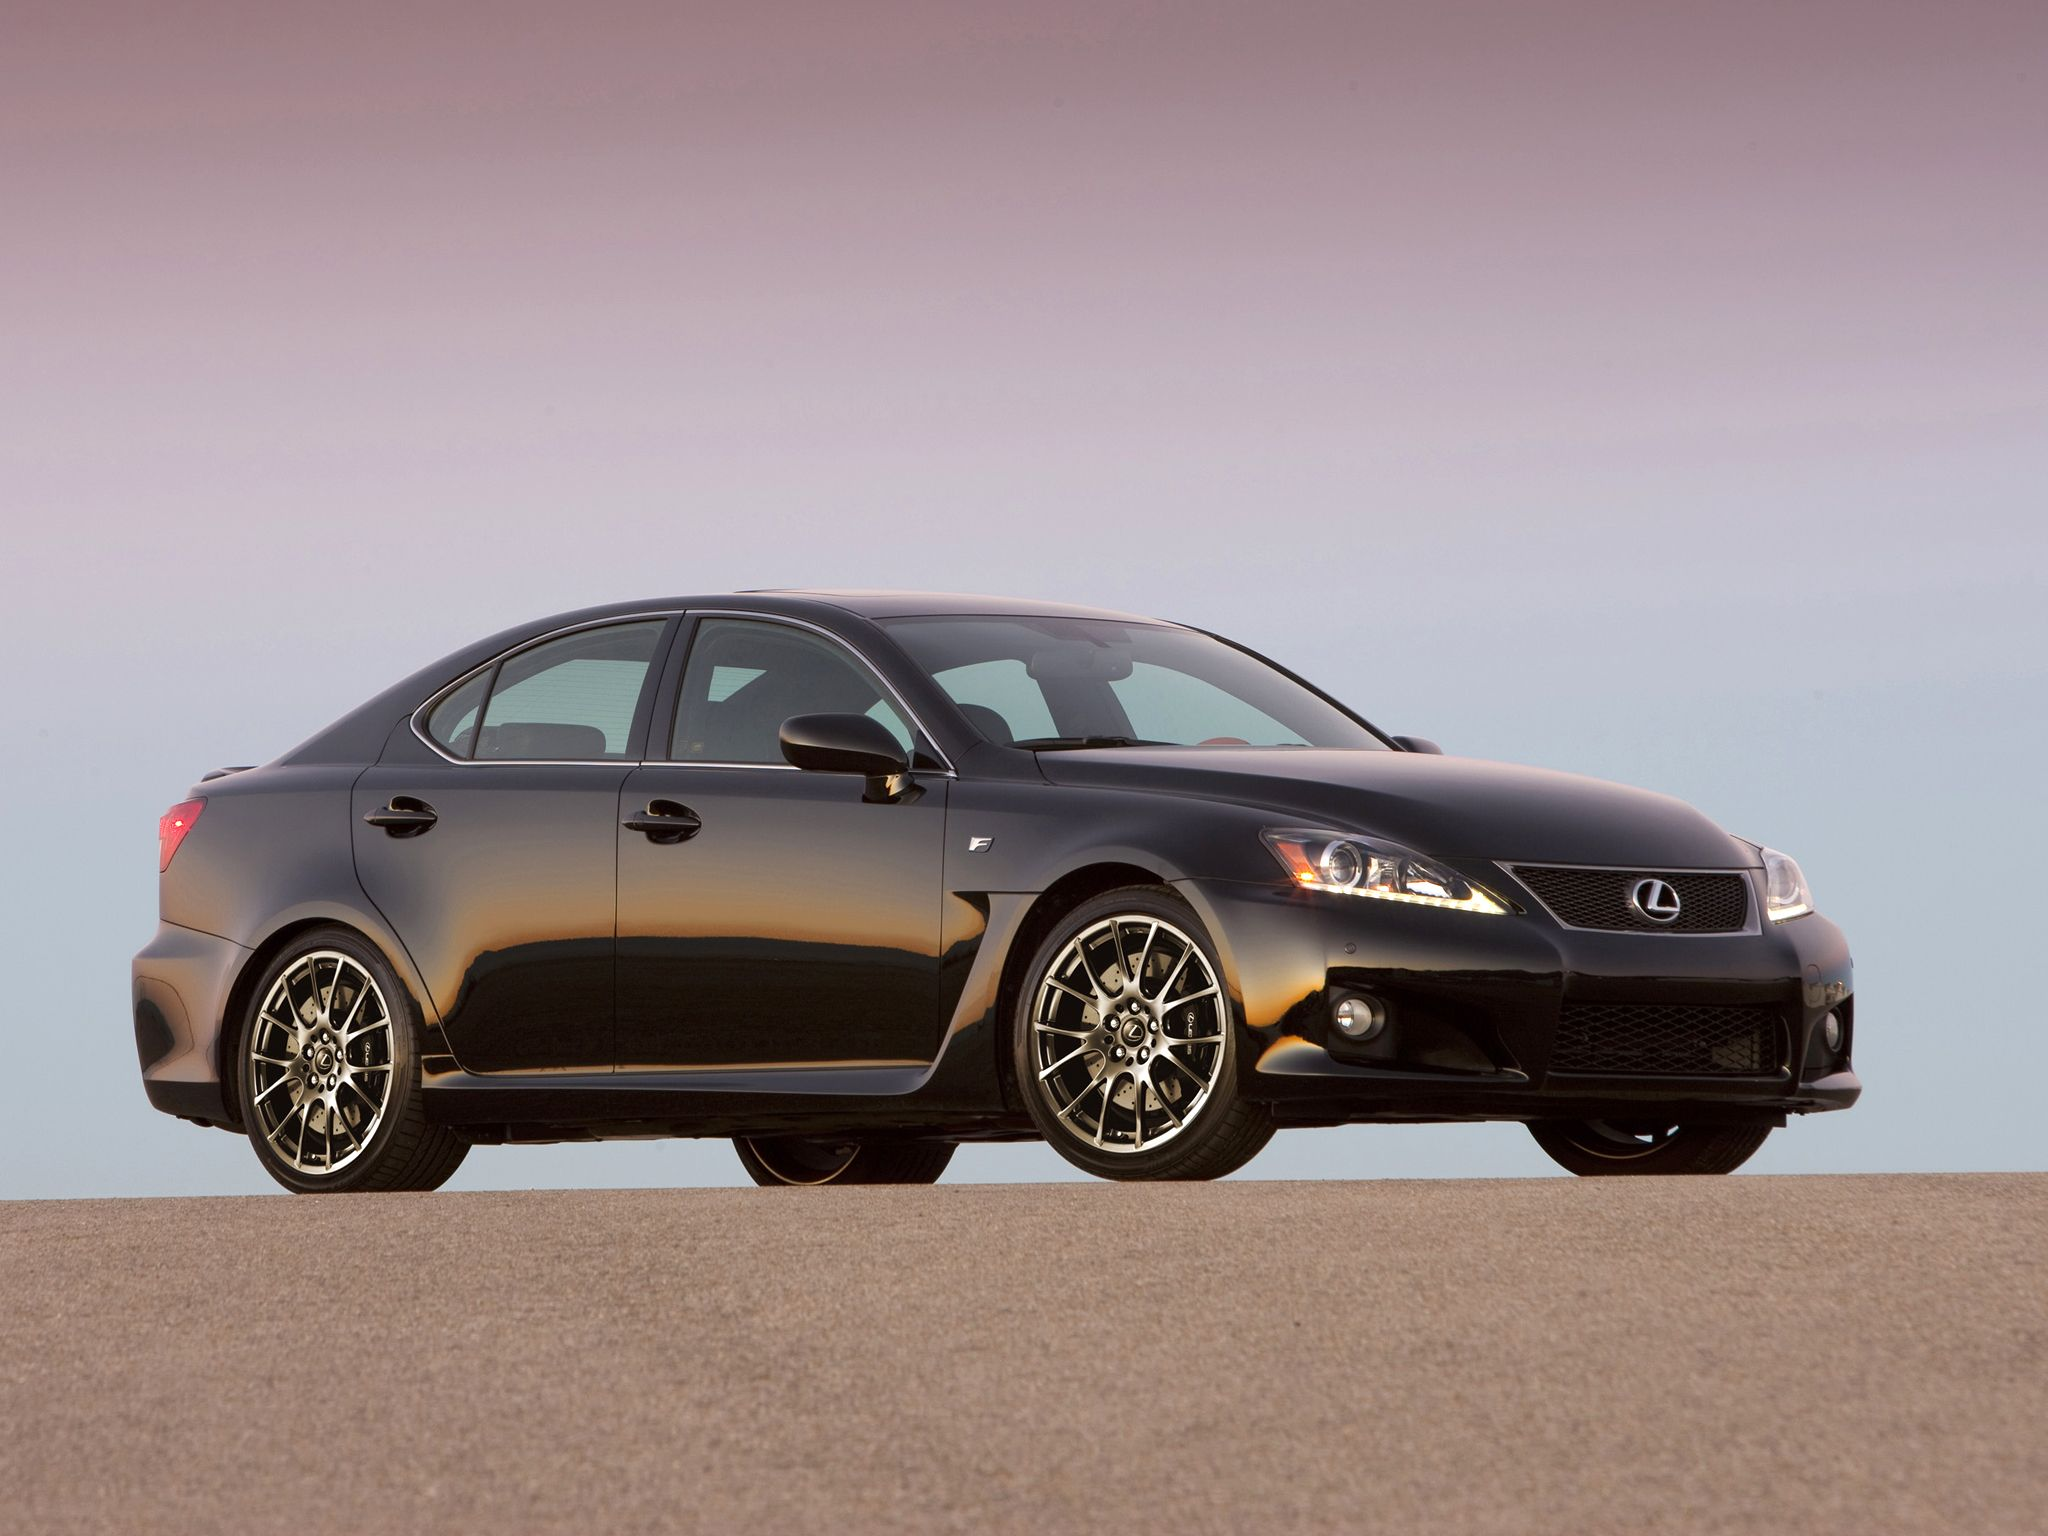 Lexus IS F Lexus isf, 4 door sports cars, Used car prices